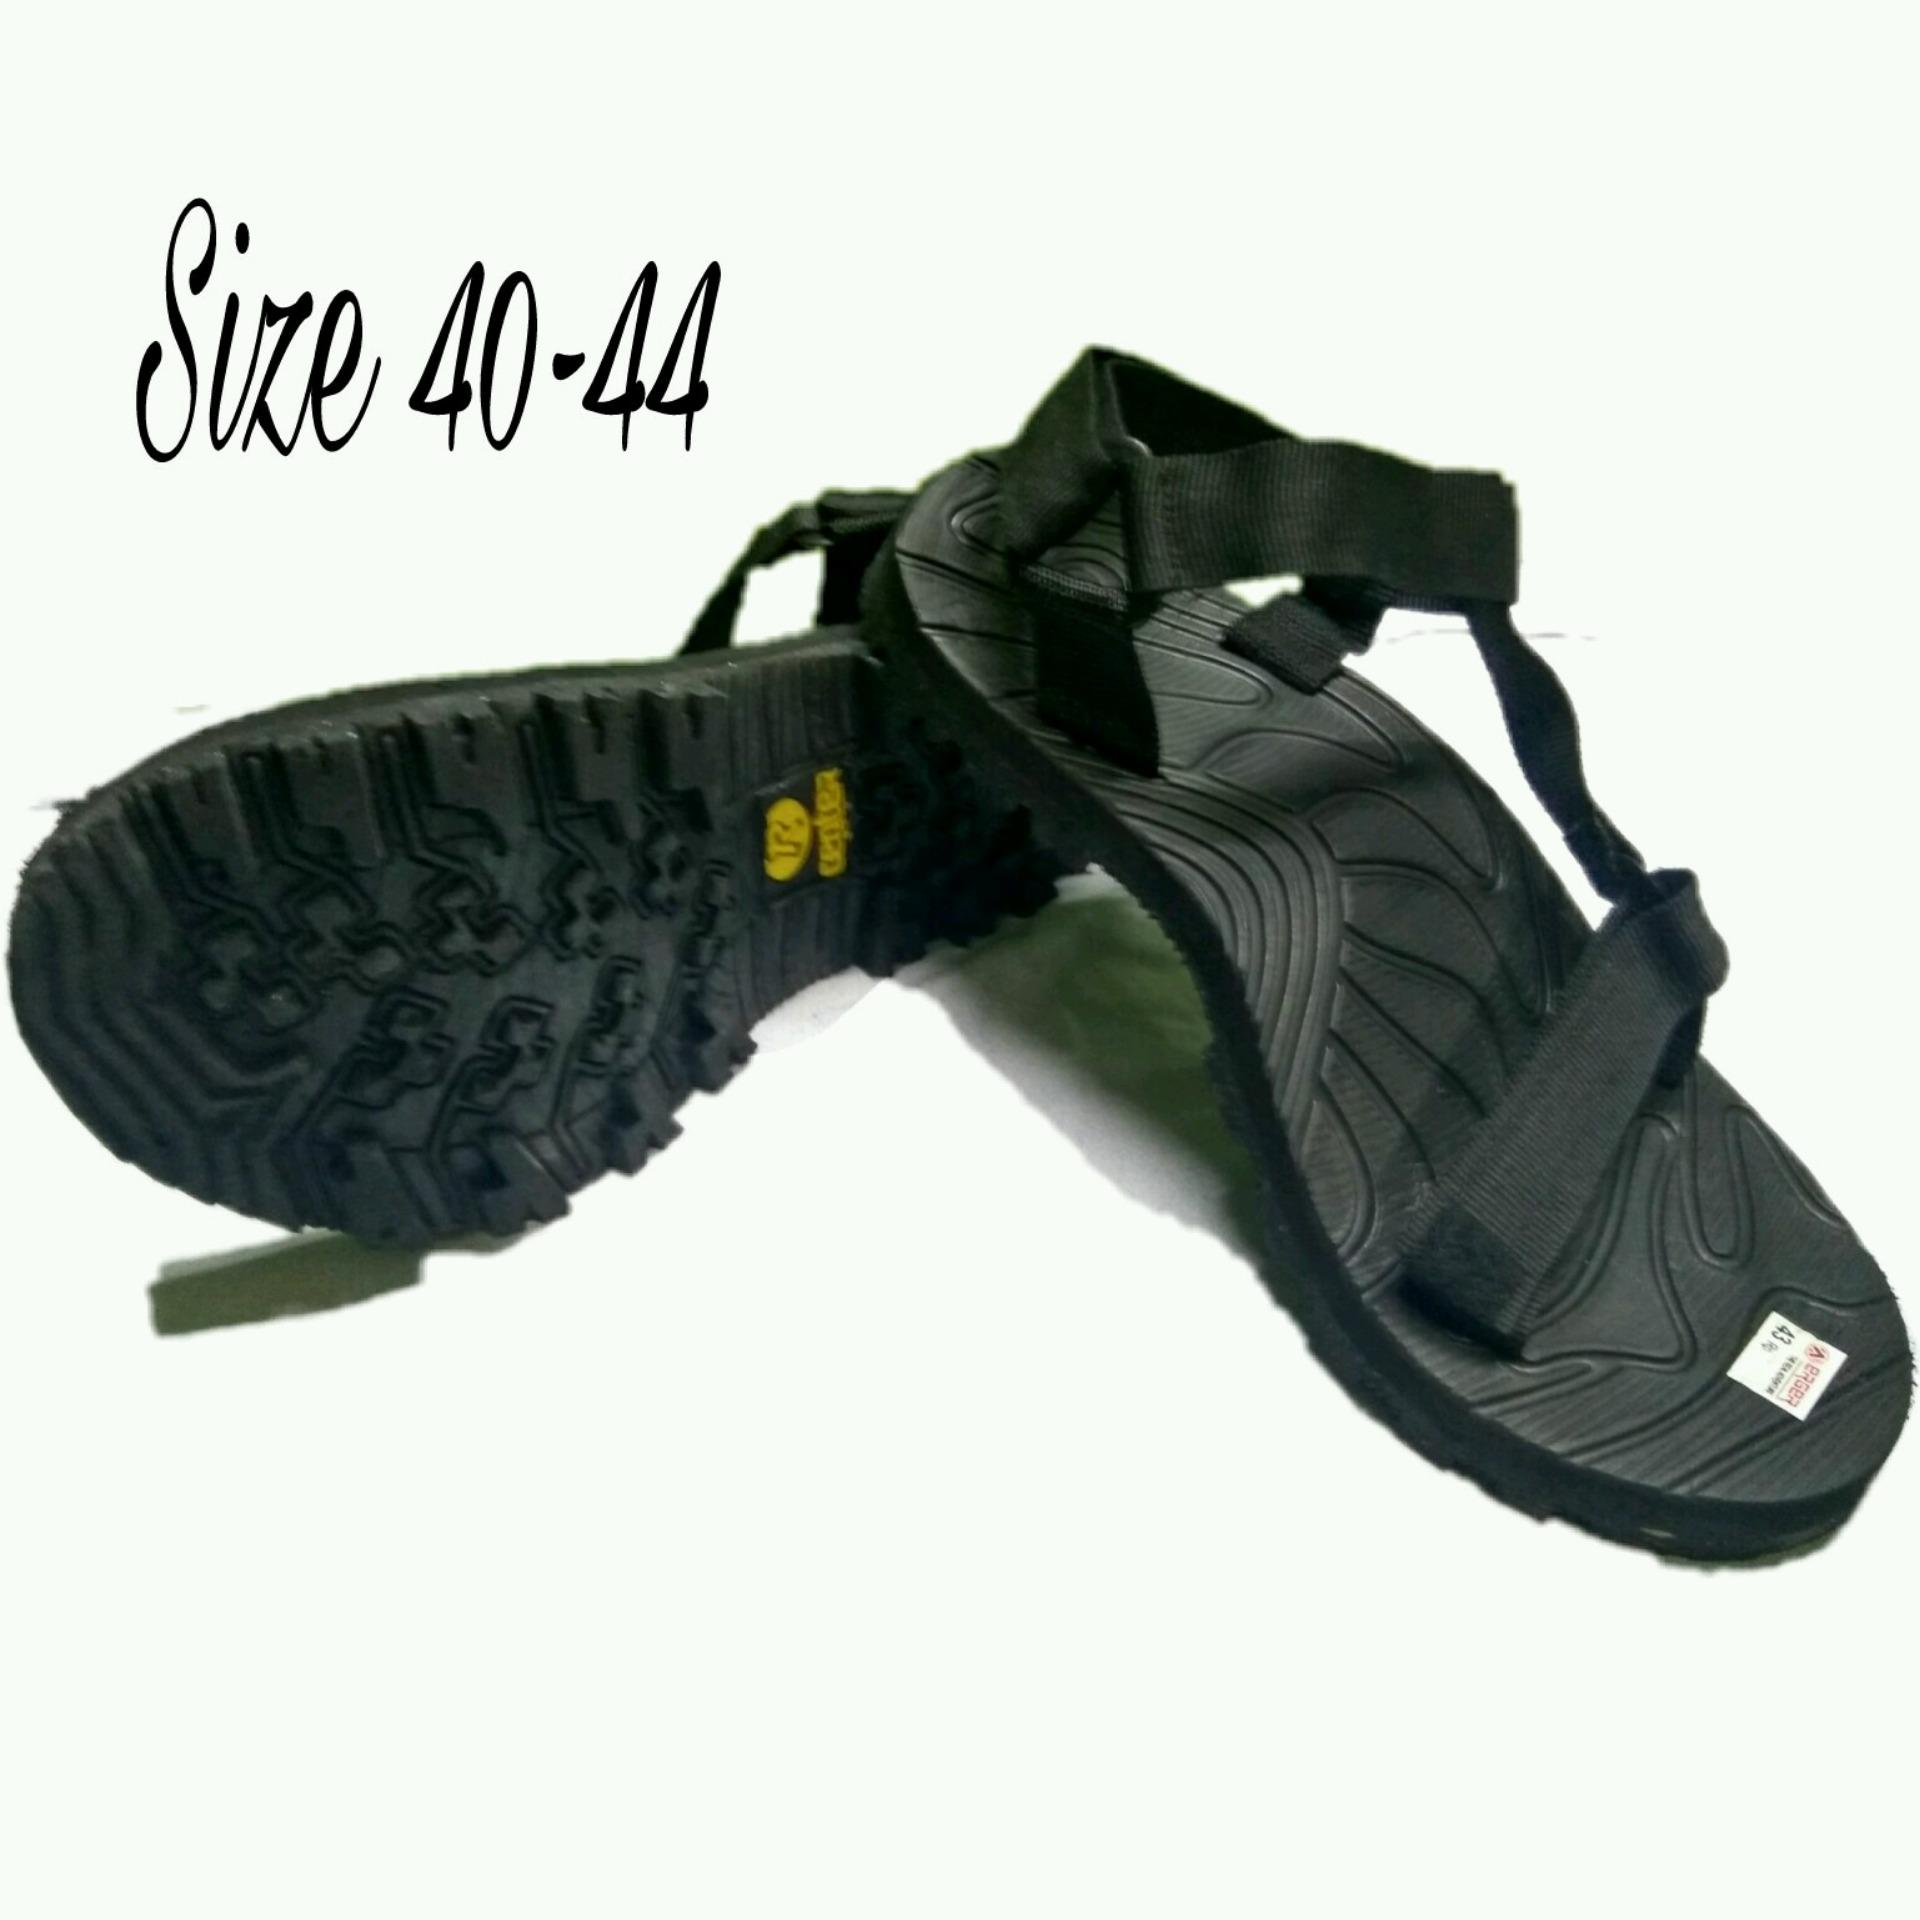 Arsy Sport Sandal Gunung Pria Zumbo Size 40 - 44